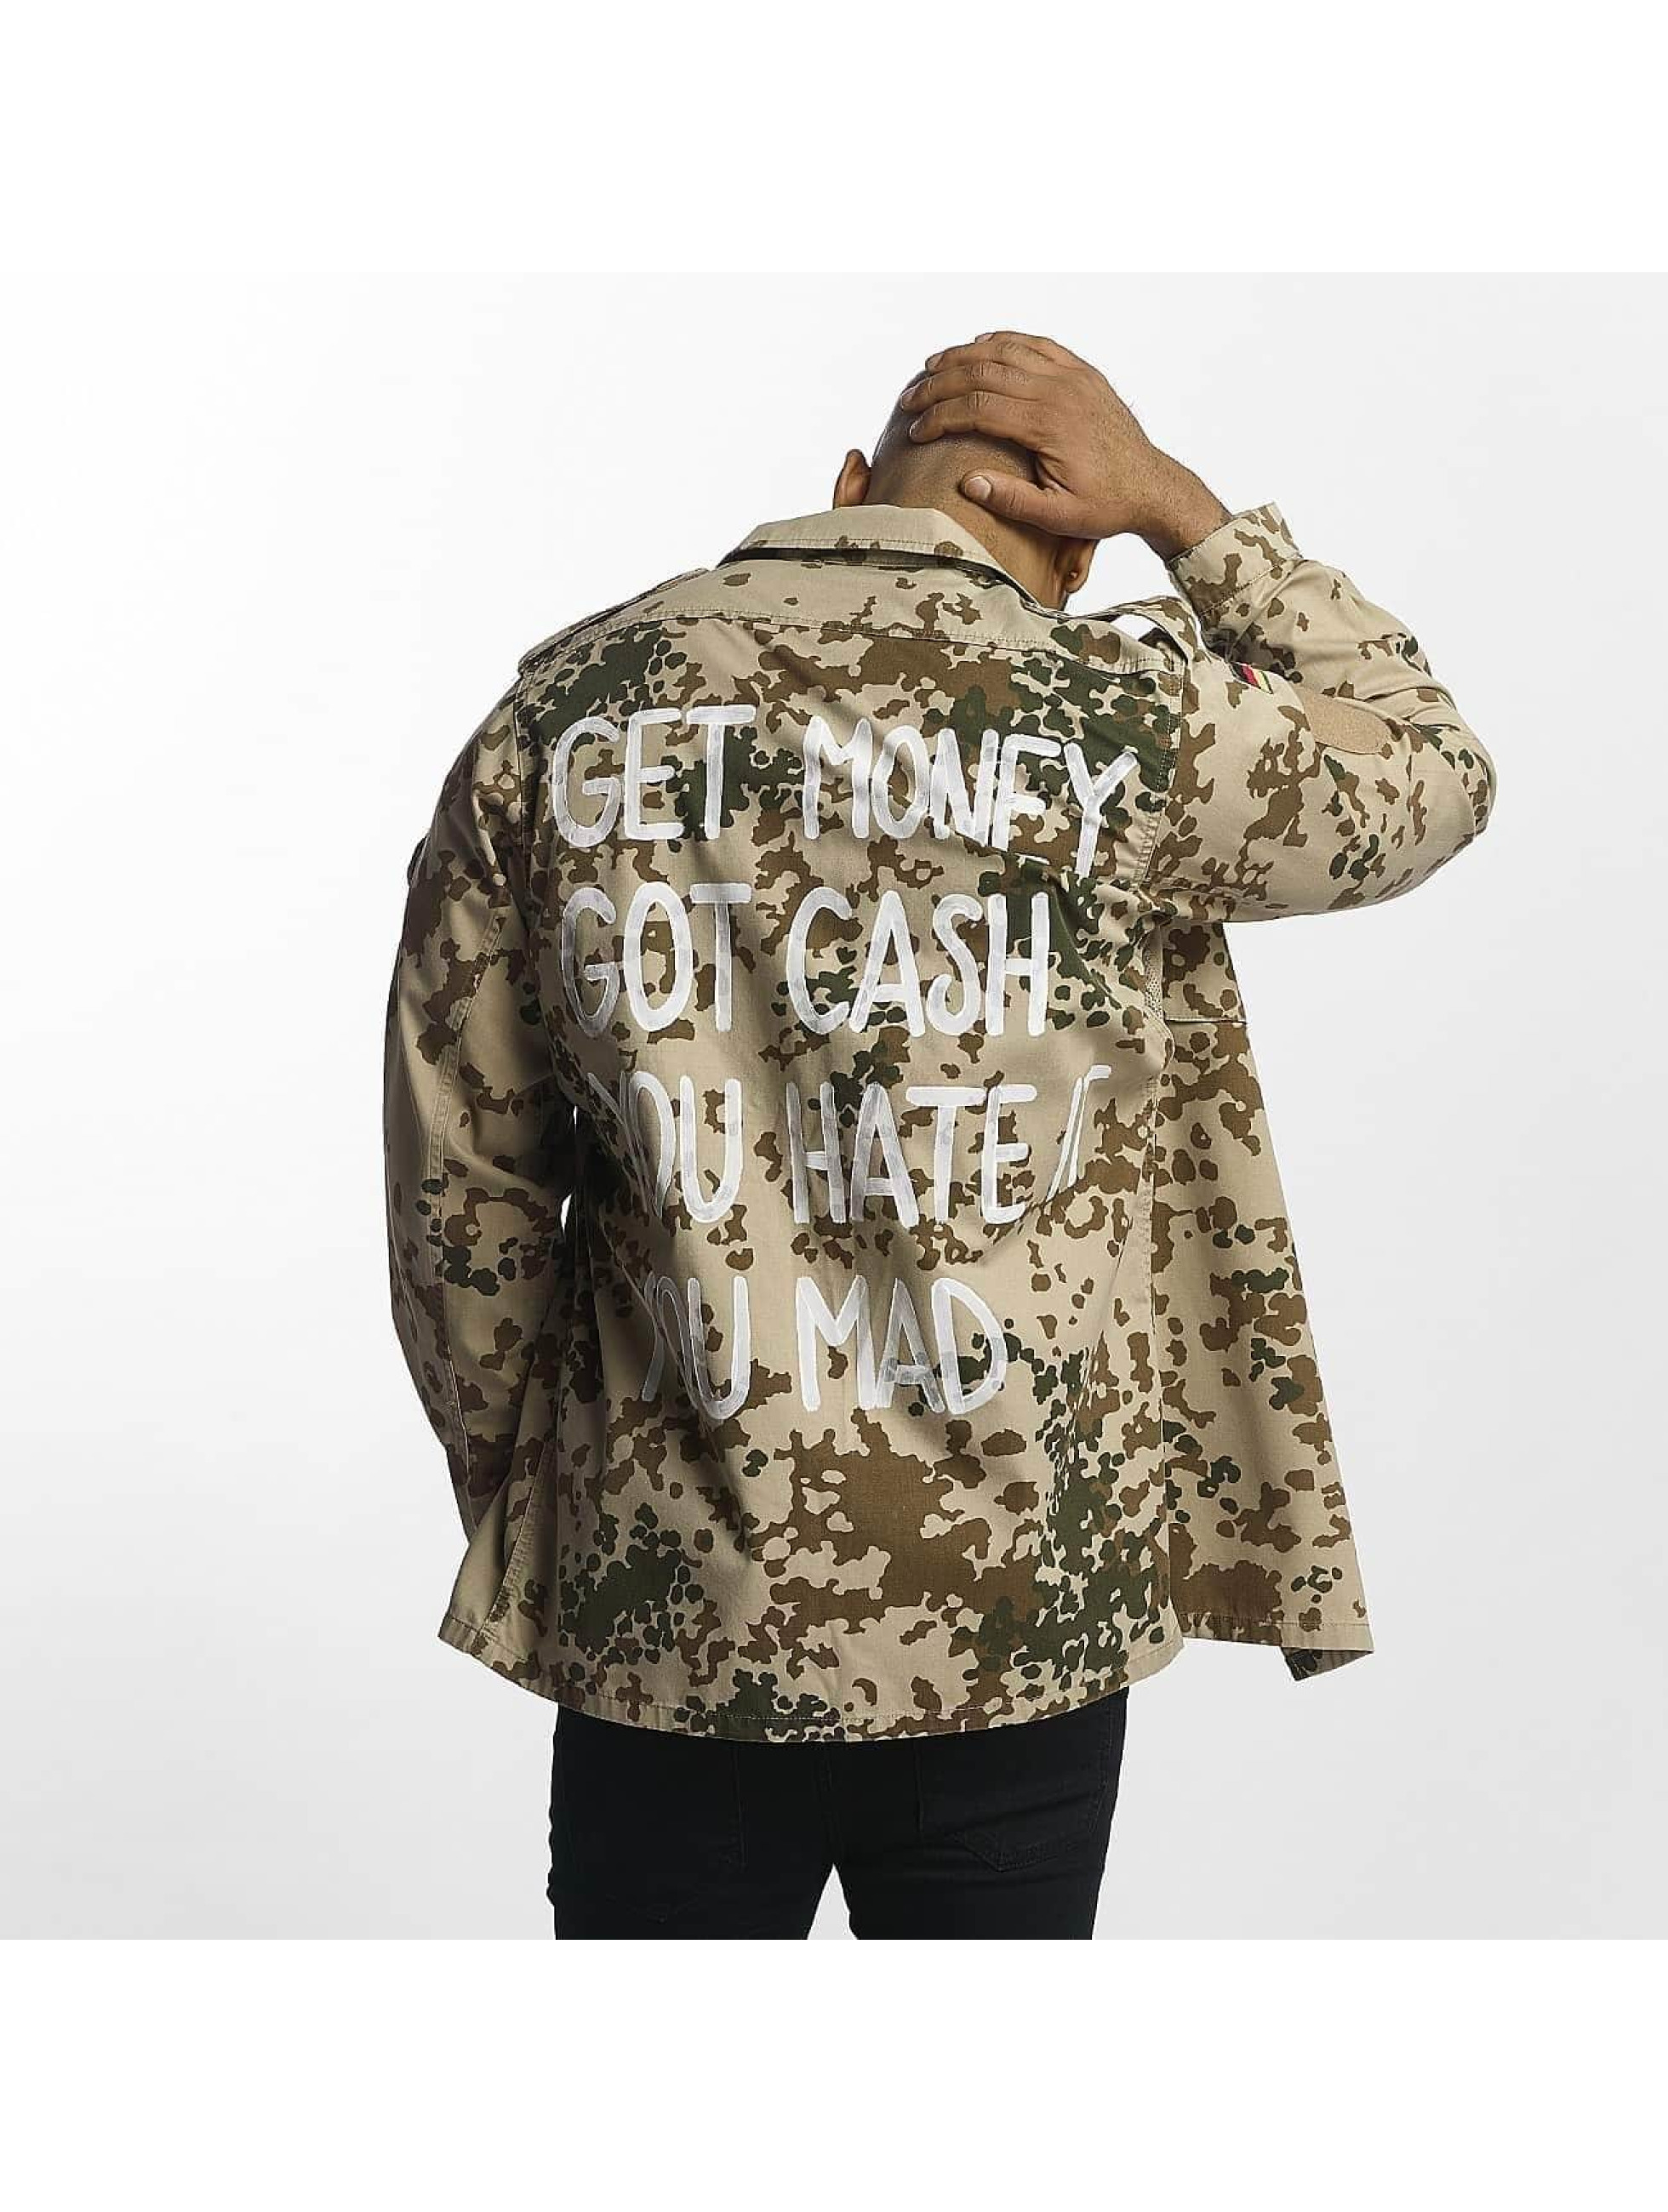 Soniush Männer Übergangsjacke Cash in camouflage